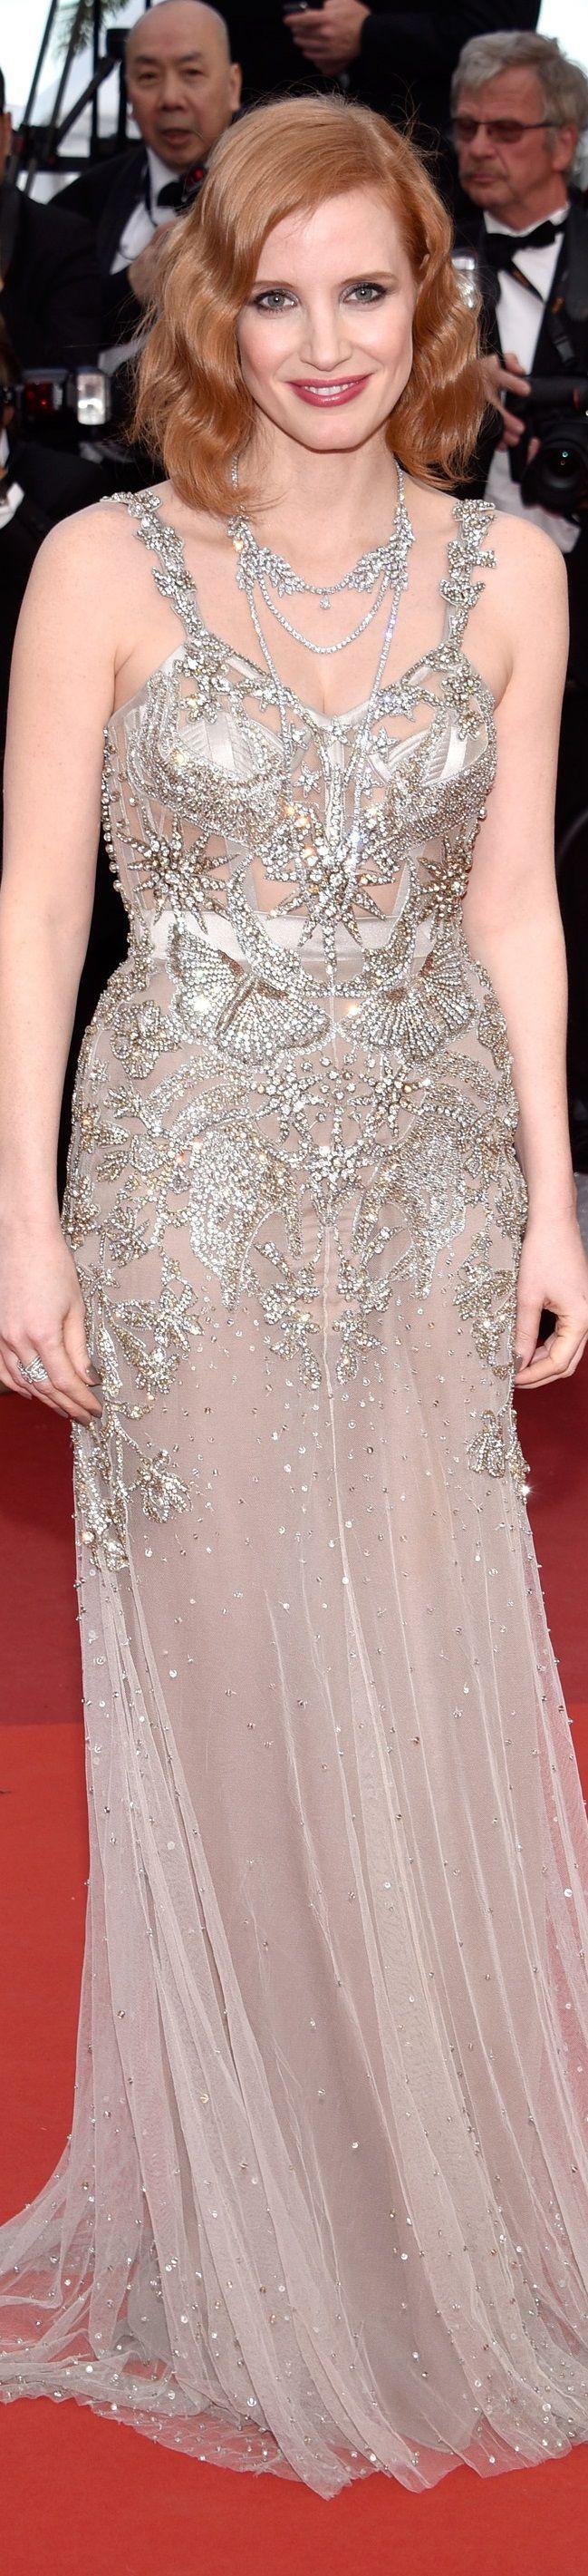 Jessica Chastain veste Alexander McQueen - Cannes 2016